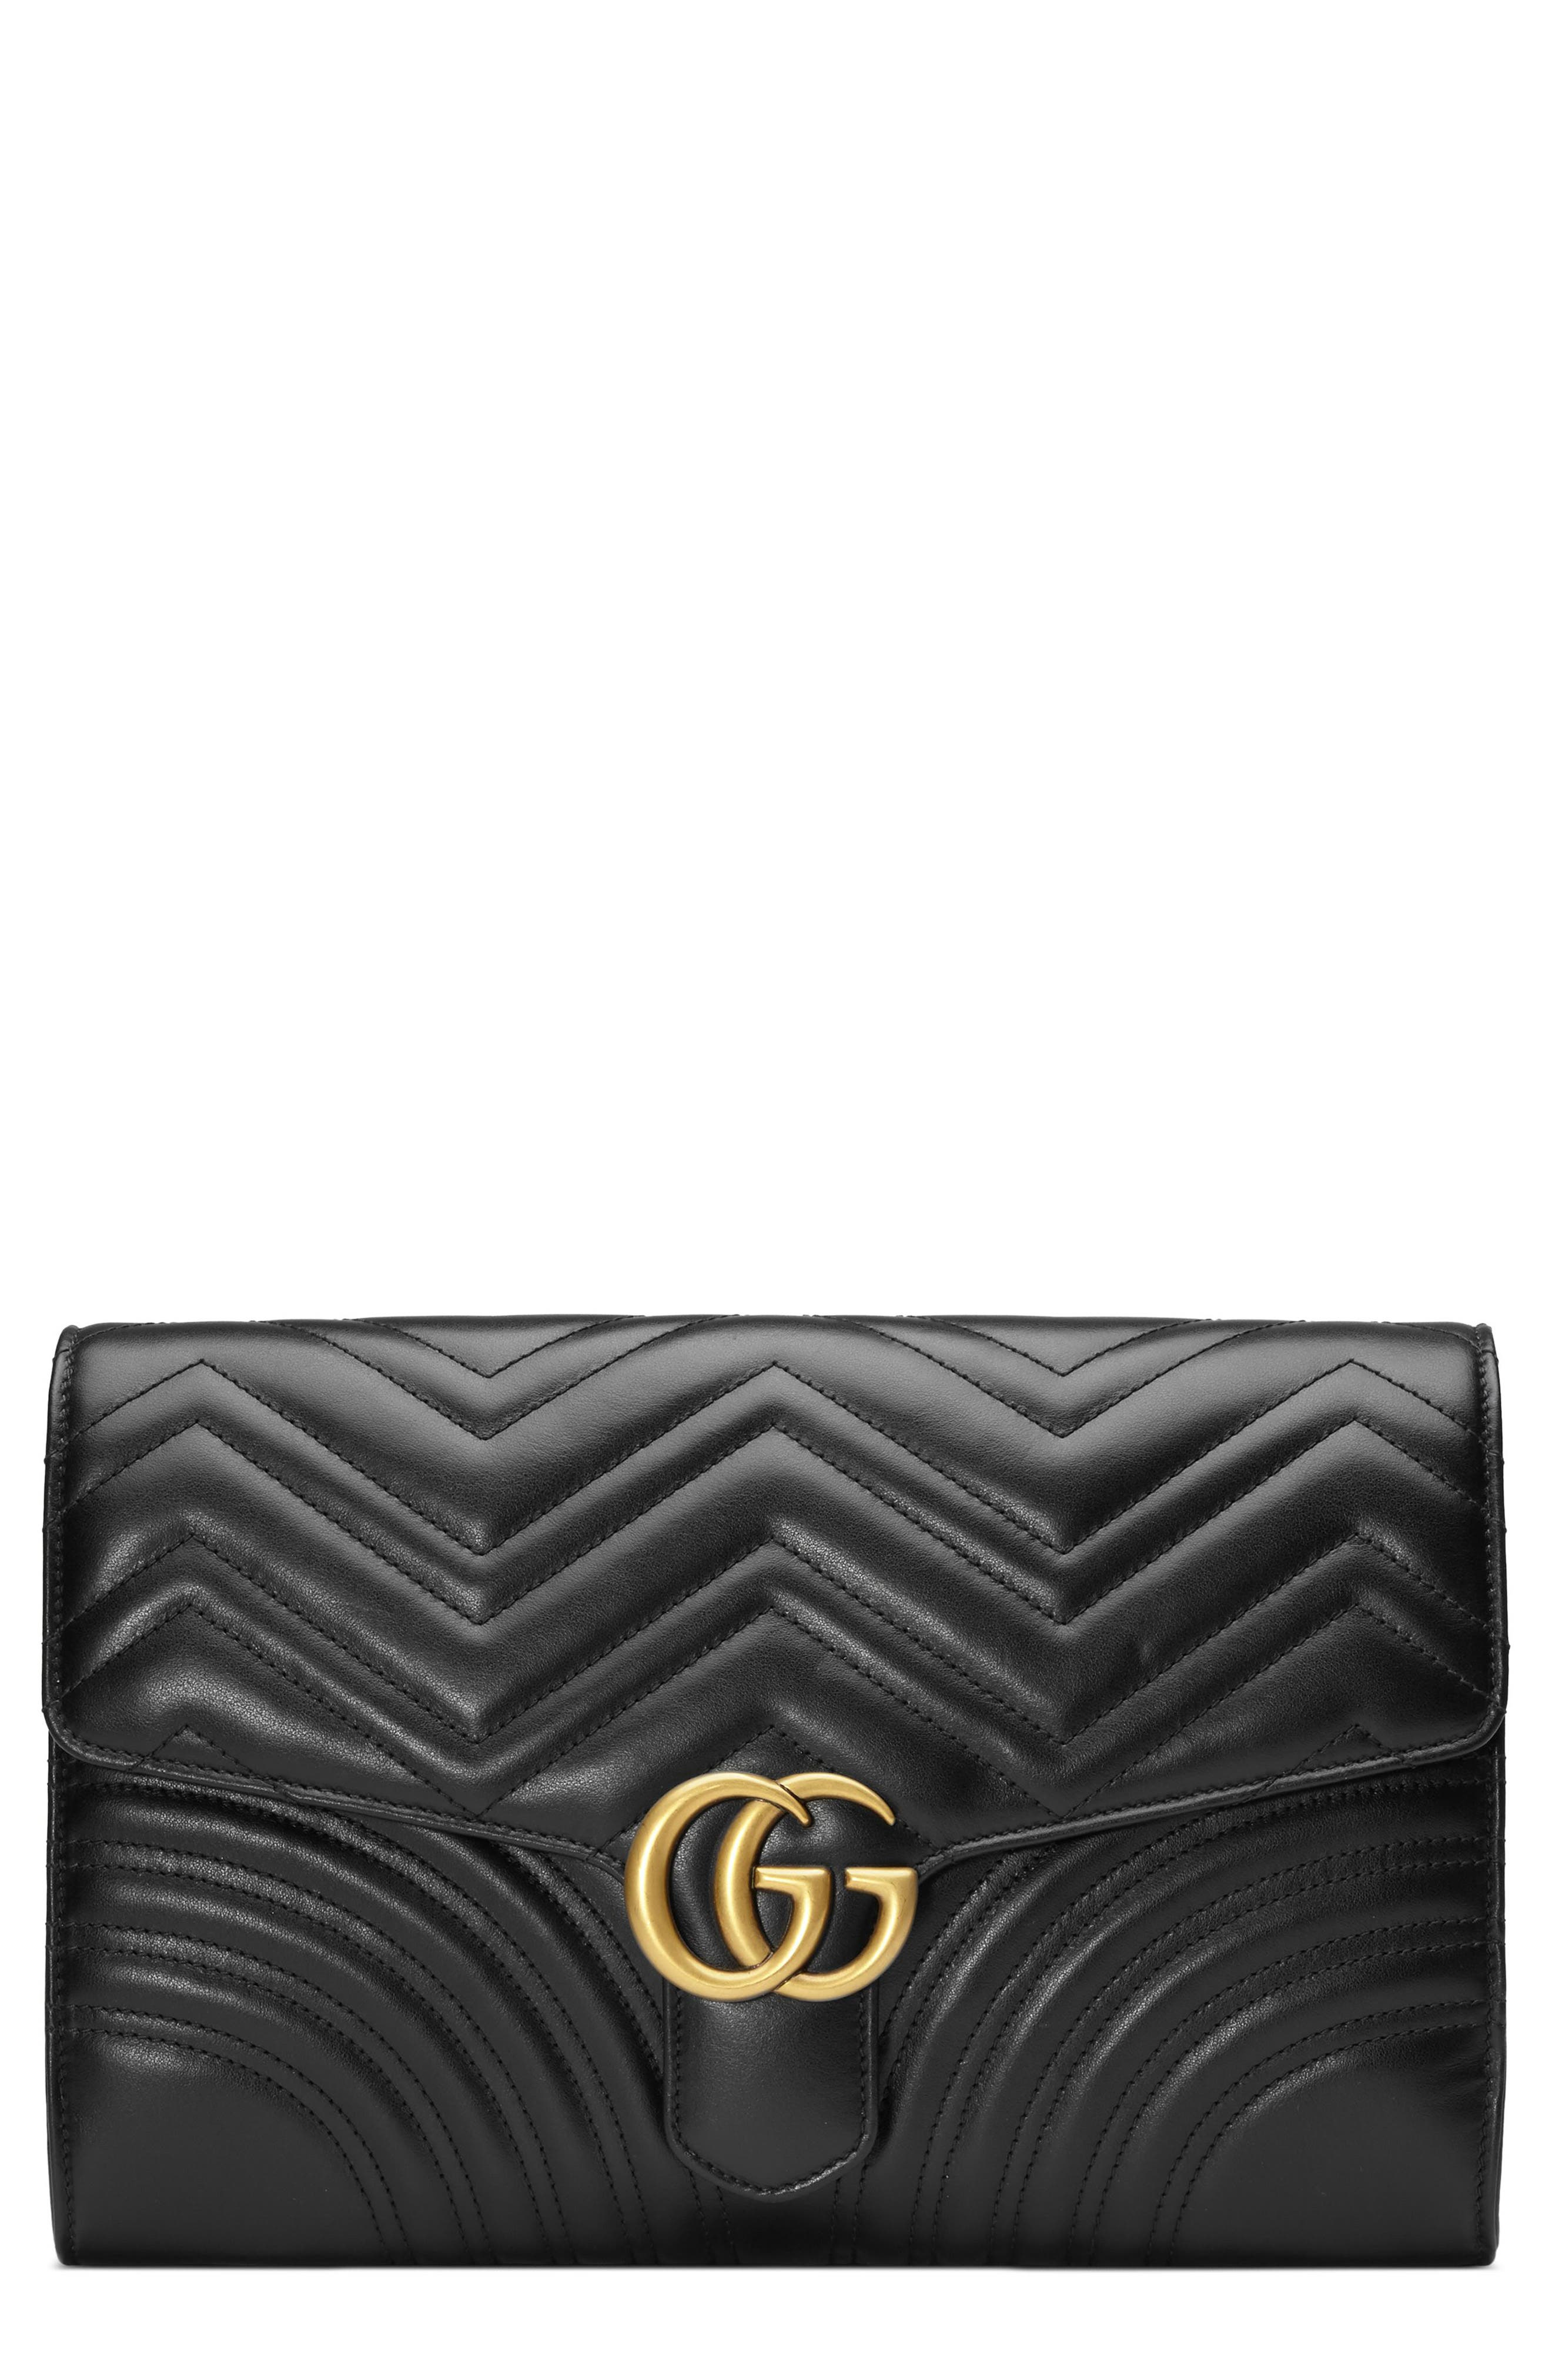 GUCCI, GG Marmont 2.0 Matelassé Leather Clutch, Main thumbnail 1, color, NERO/ NERO